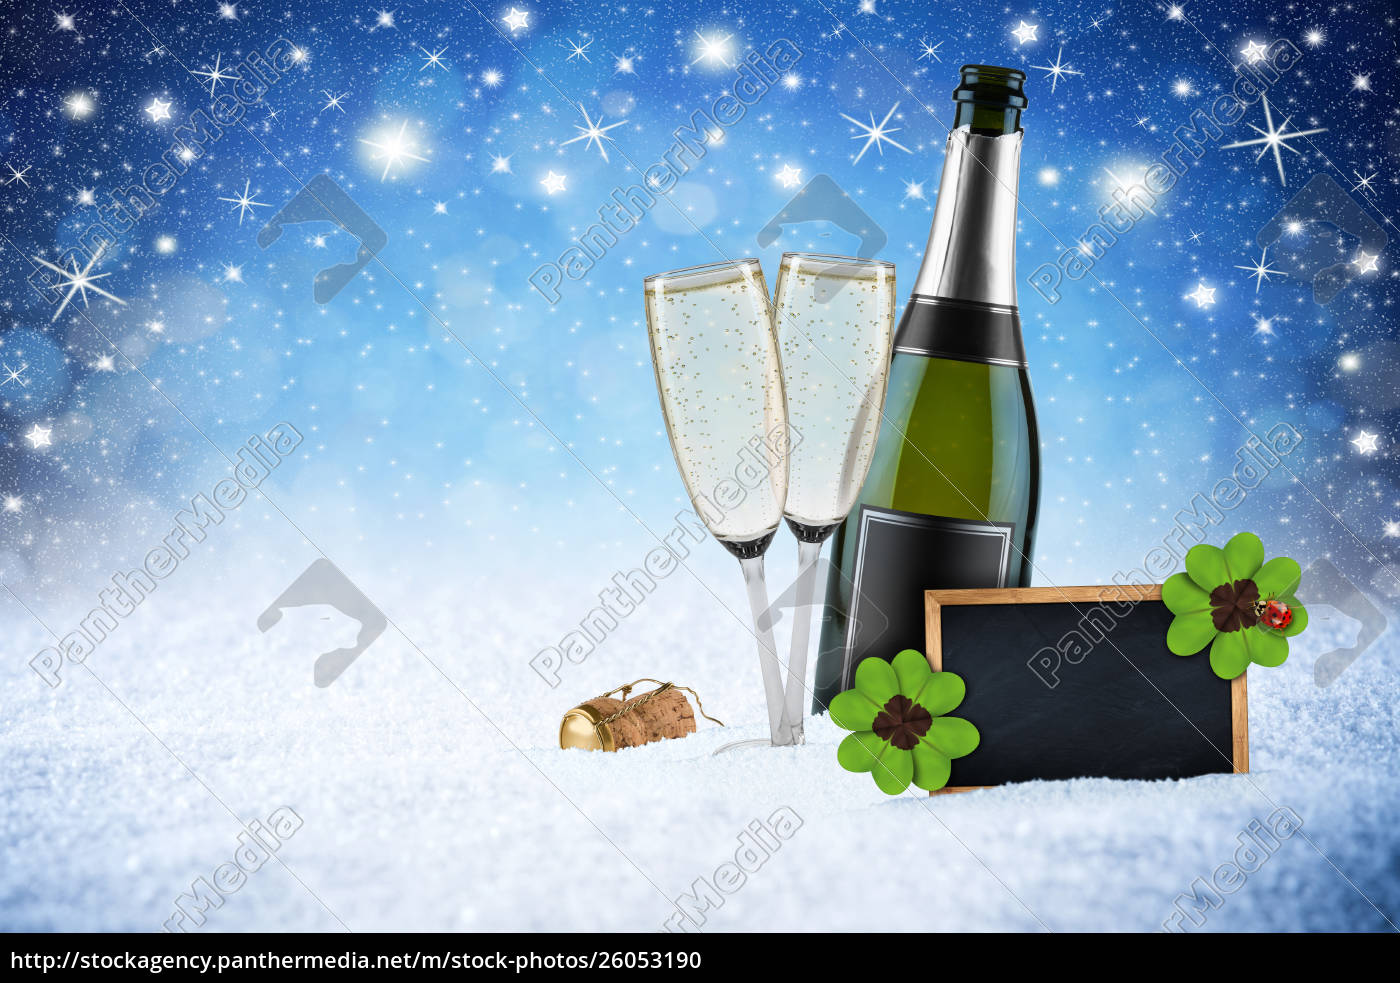 happy, new, year, ice, blue, snow - 26053190